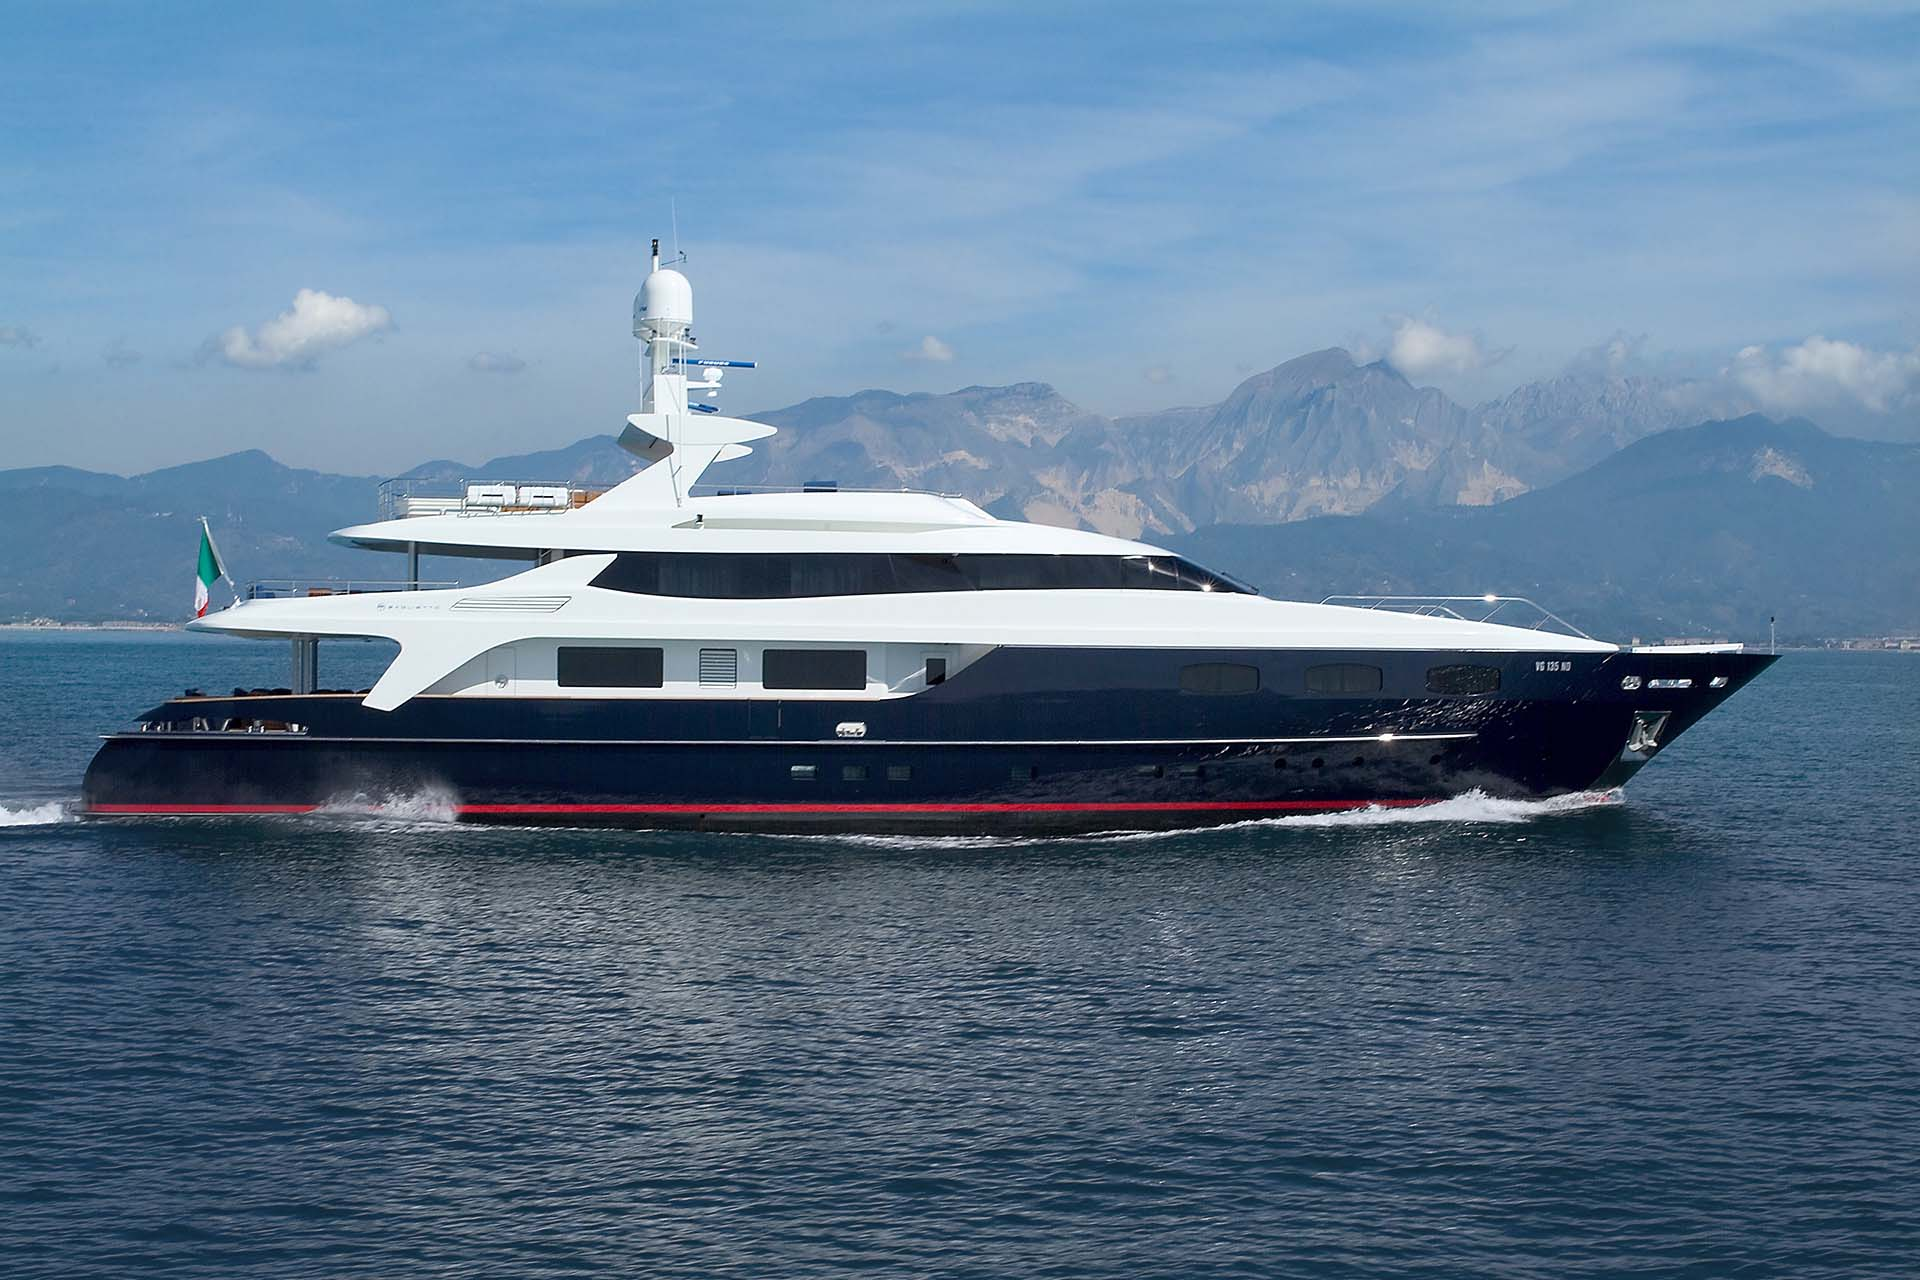 baglietto - BLUE EYES - Paskowsky Yacht Design